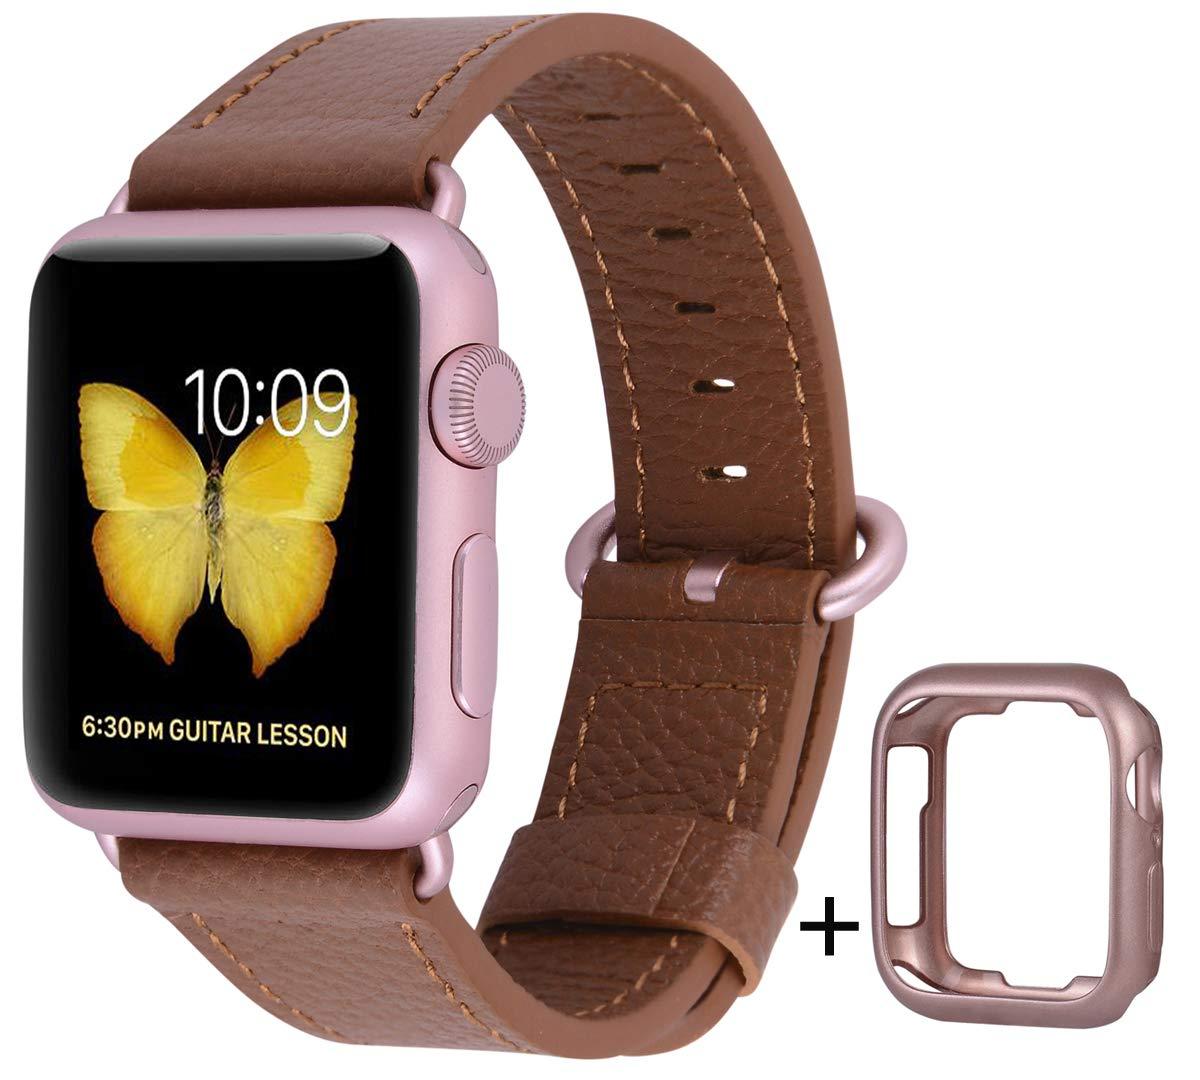 Malla Cuero para Apple Watch (38/40mm) PEAK ZHANG [7P7TK4NW]